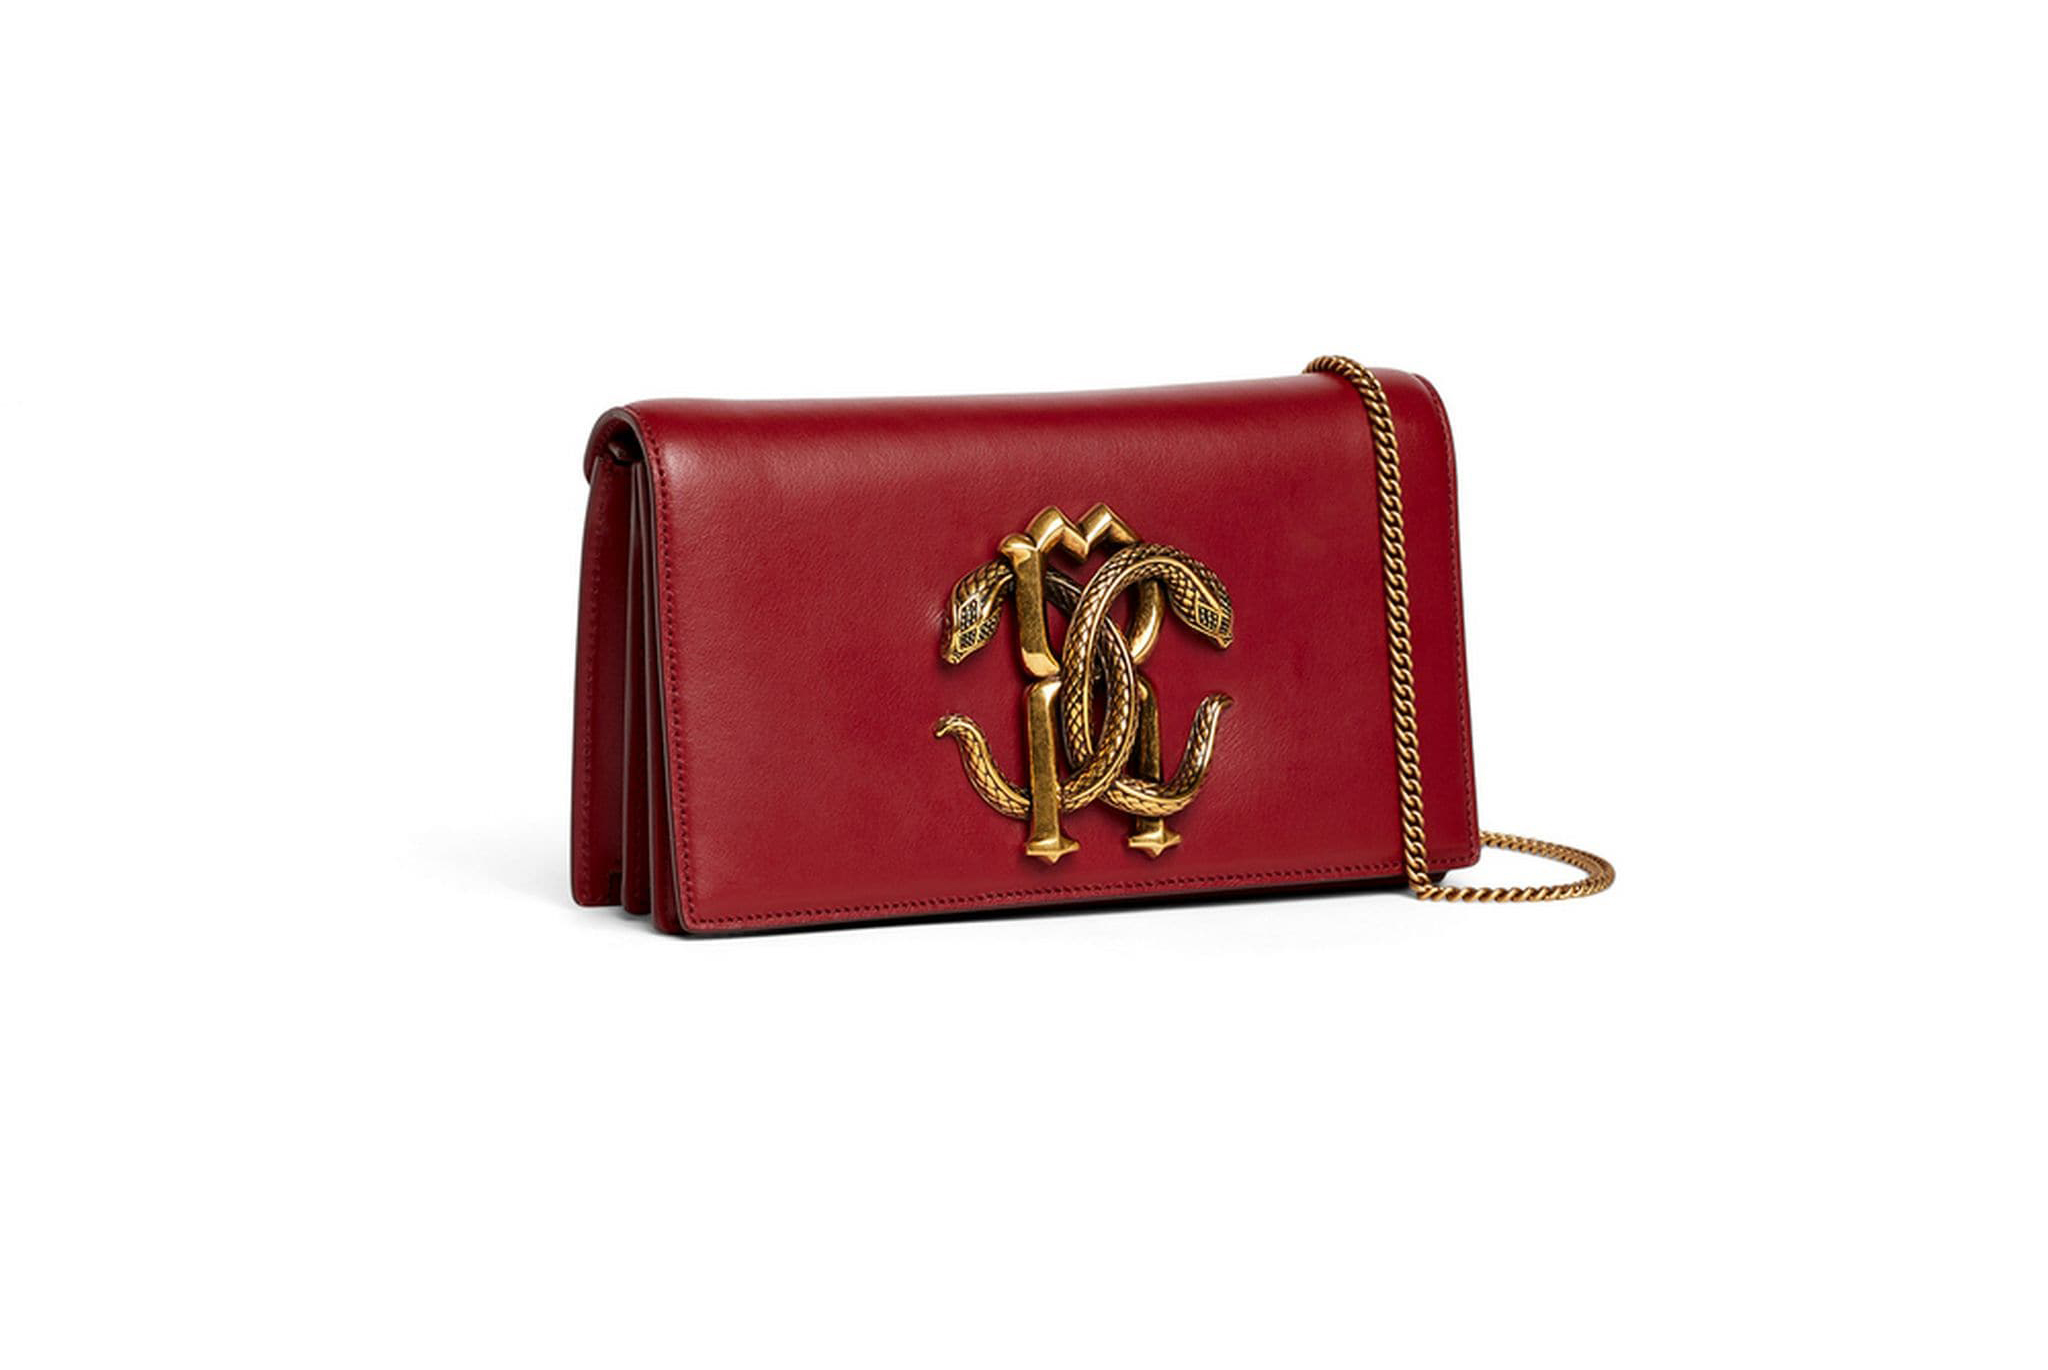 roberto-cavalli-mirror-snake-logo-shoulder-bag_12944884_14226377_2048